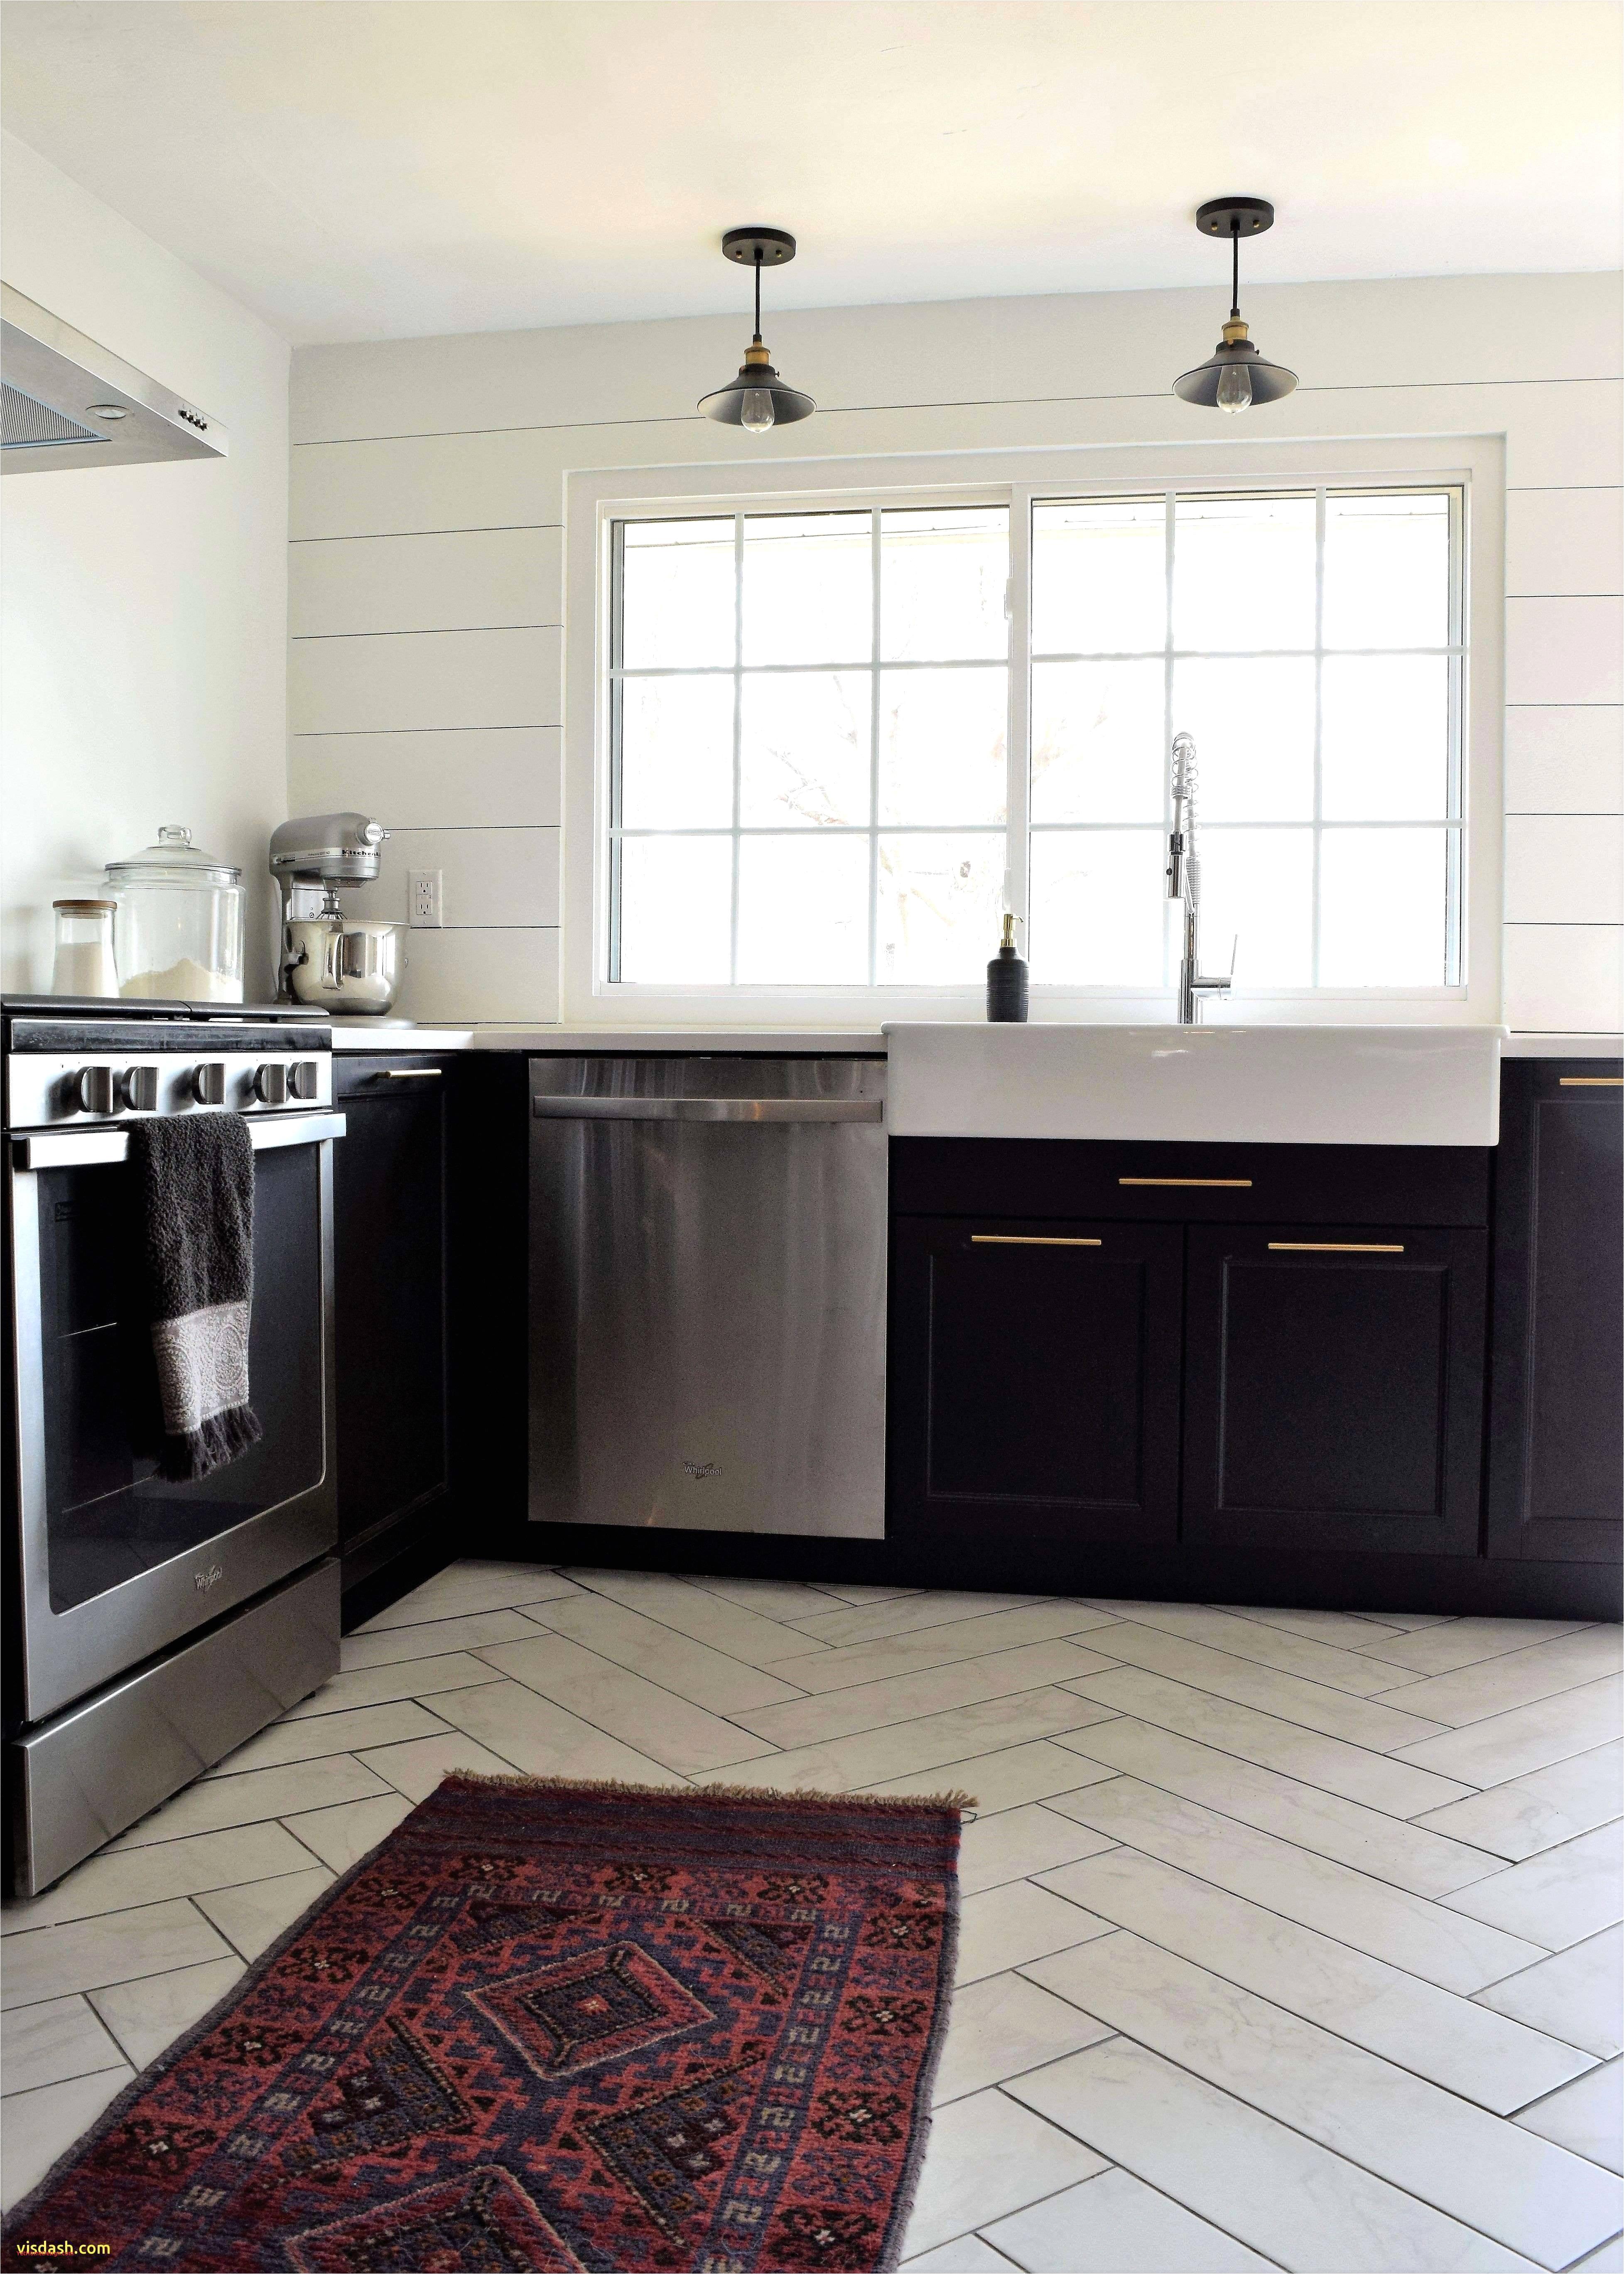 Klearvue Cabinets Vs Ikea | AdinaPorter